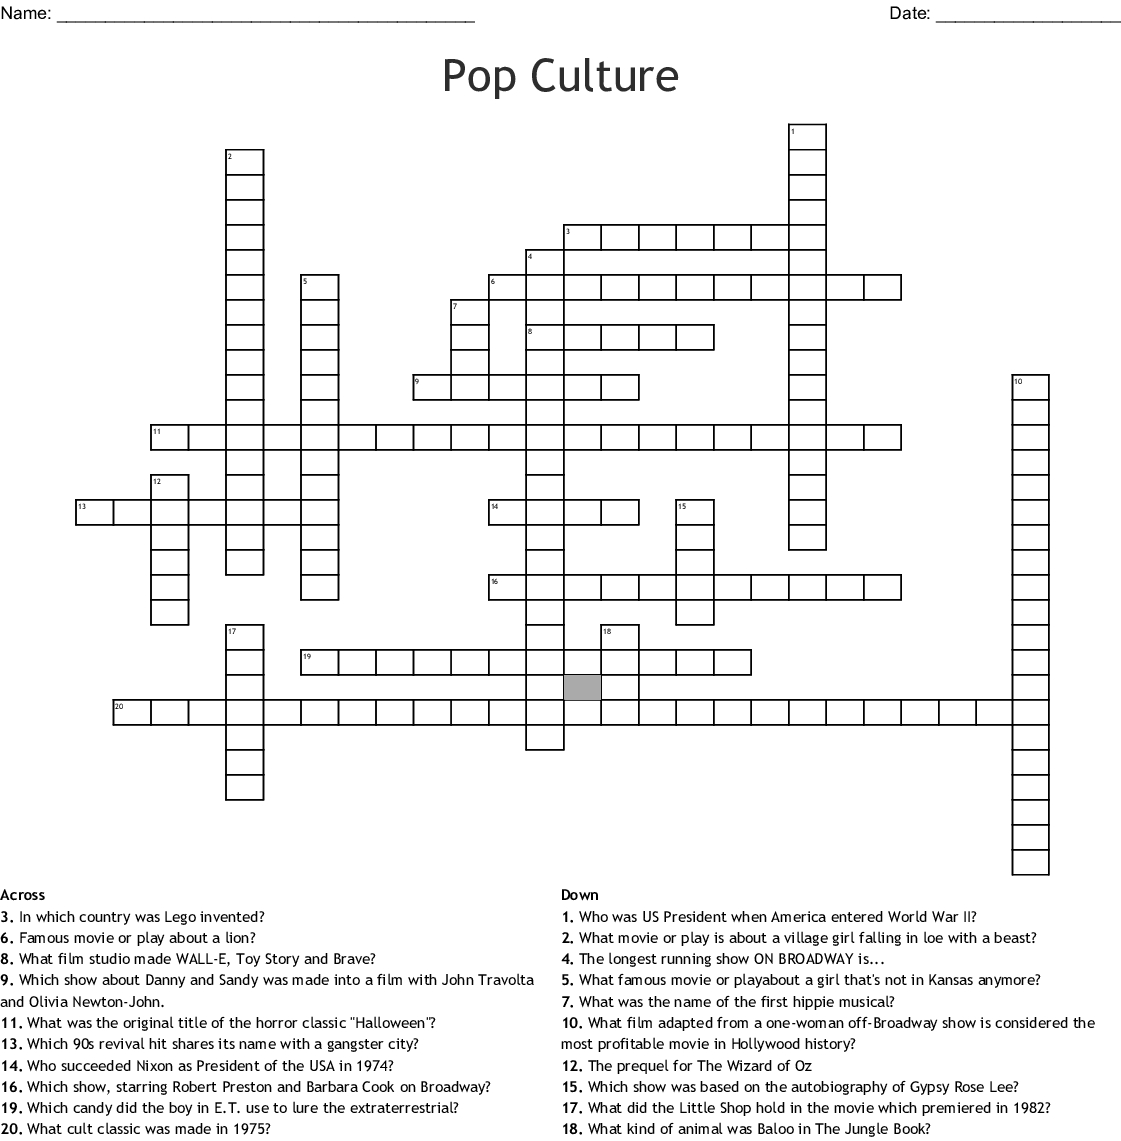 Pop Culture Crossword - Wordmint - Printable Crossword Puzzles Pop Culture